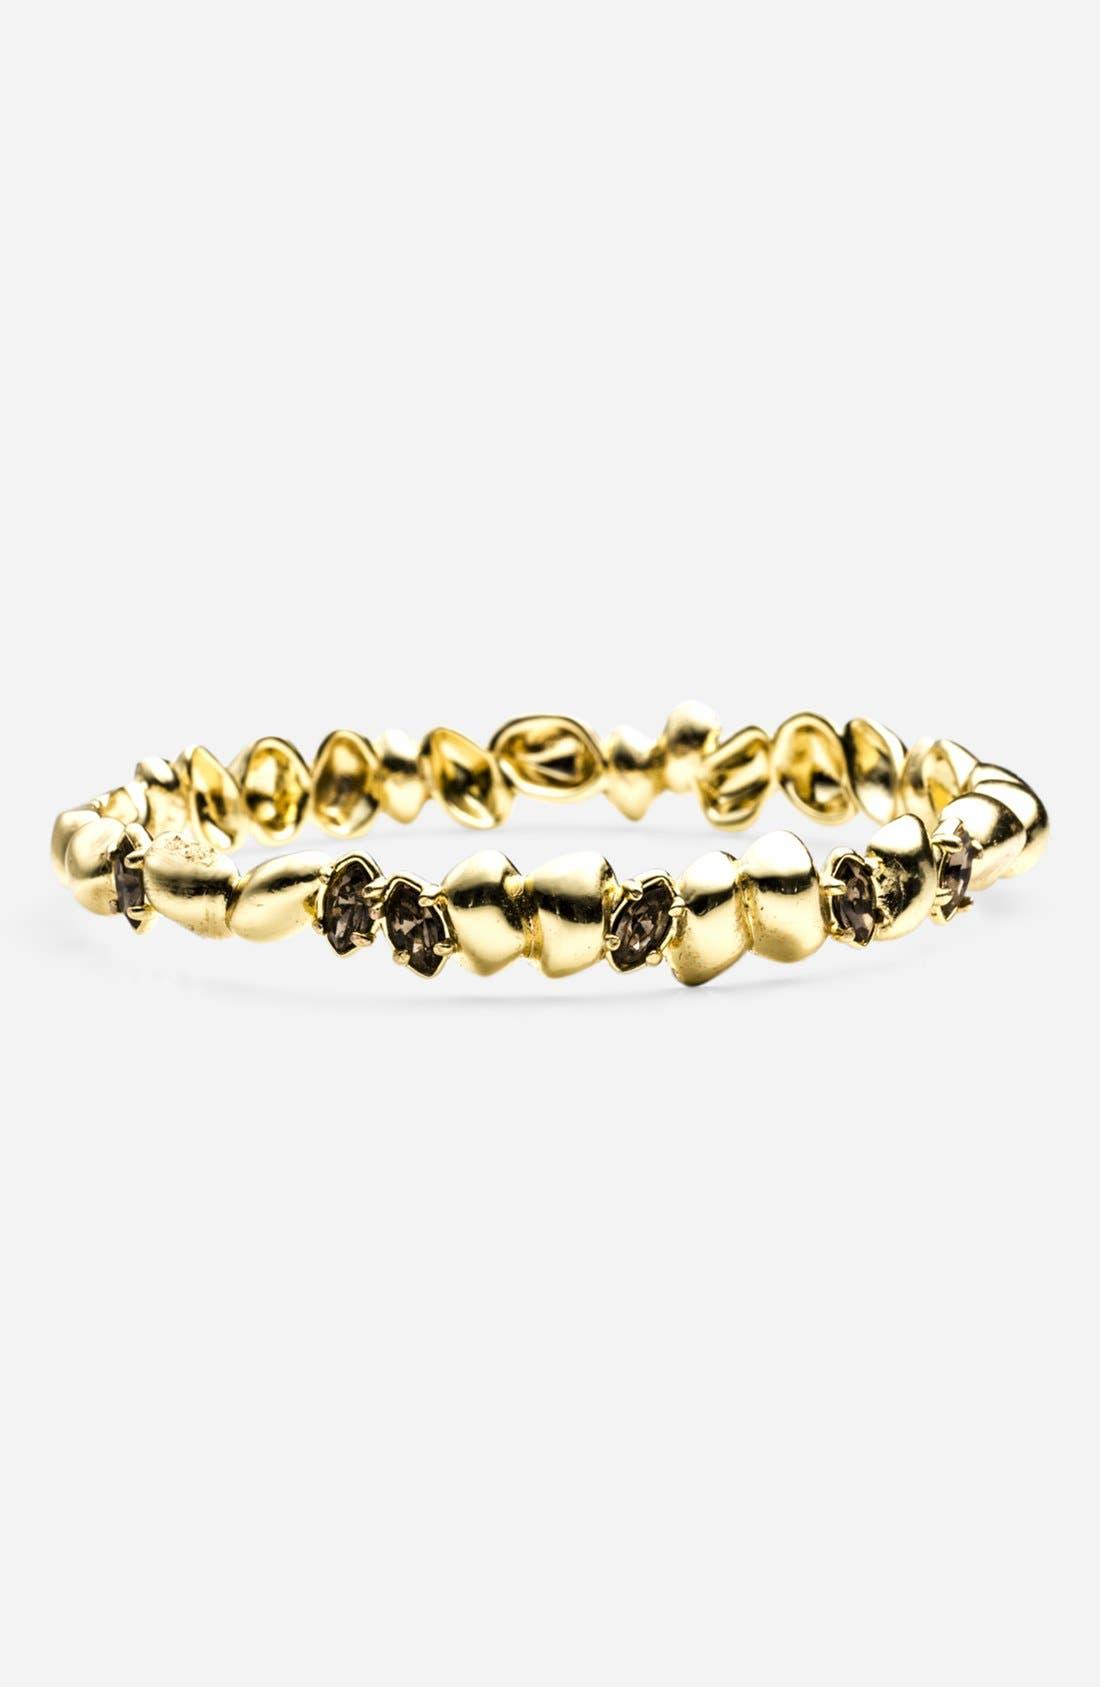 Alternate Image 1 Selected - Alexis Bittar 'Miss Havisham' Skinny Hinged Bracelet